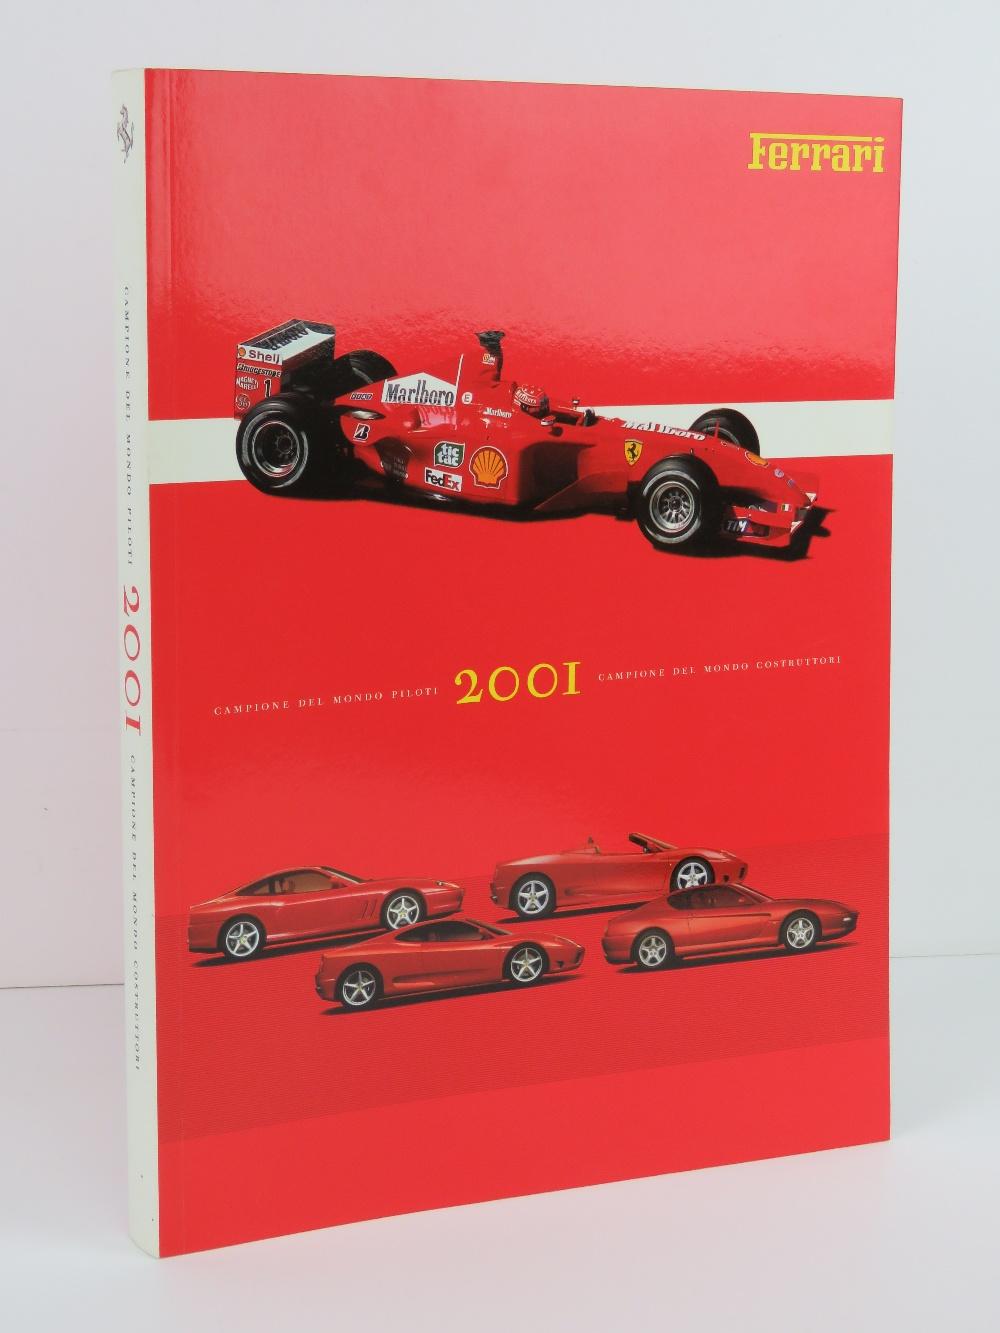 Ferrari Yearbook 2001. English / Italian edition. Softback book.